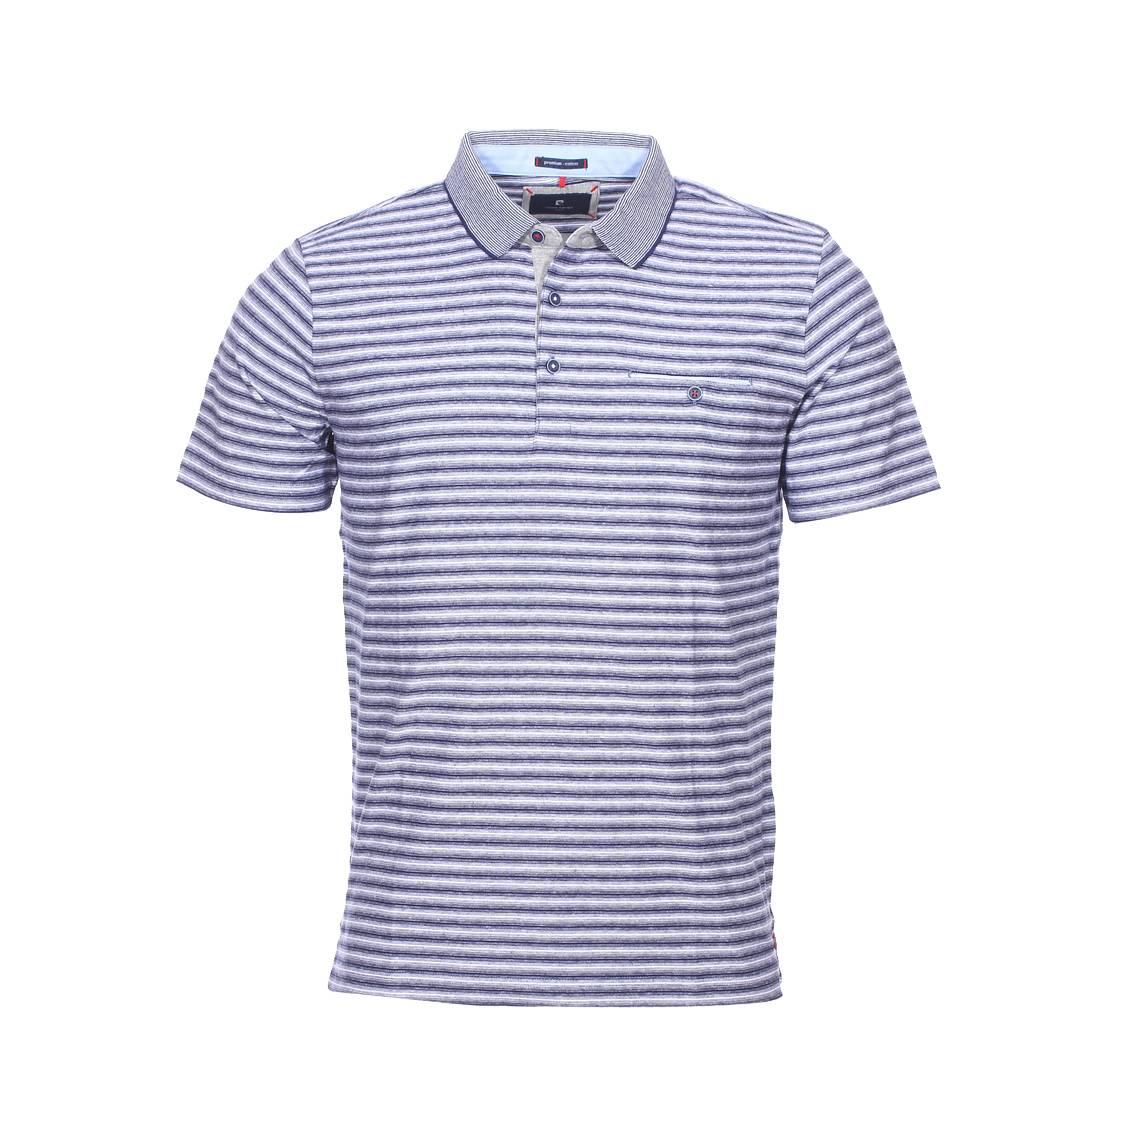 Polo  en coton à fines rayures bleu marine et blanches